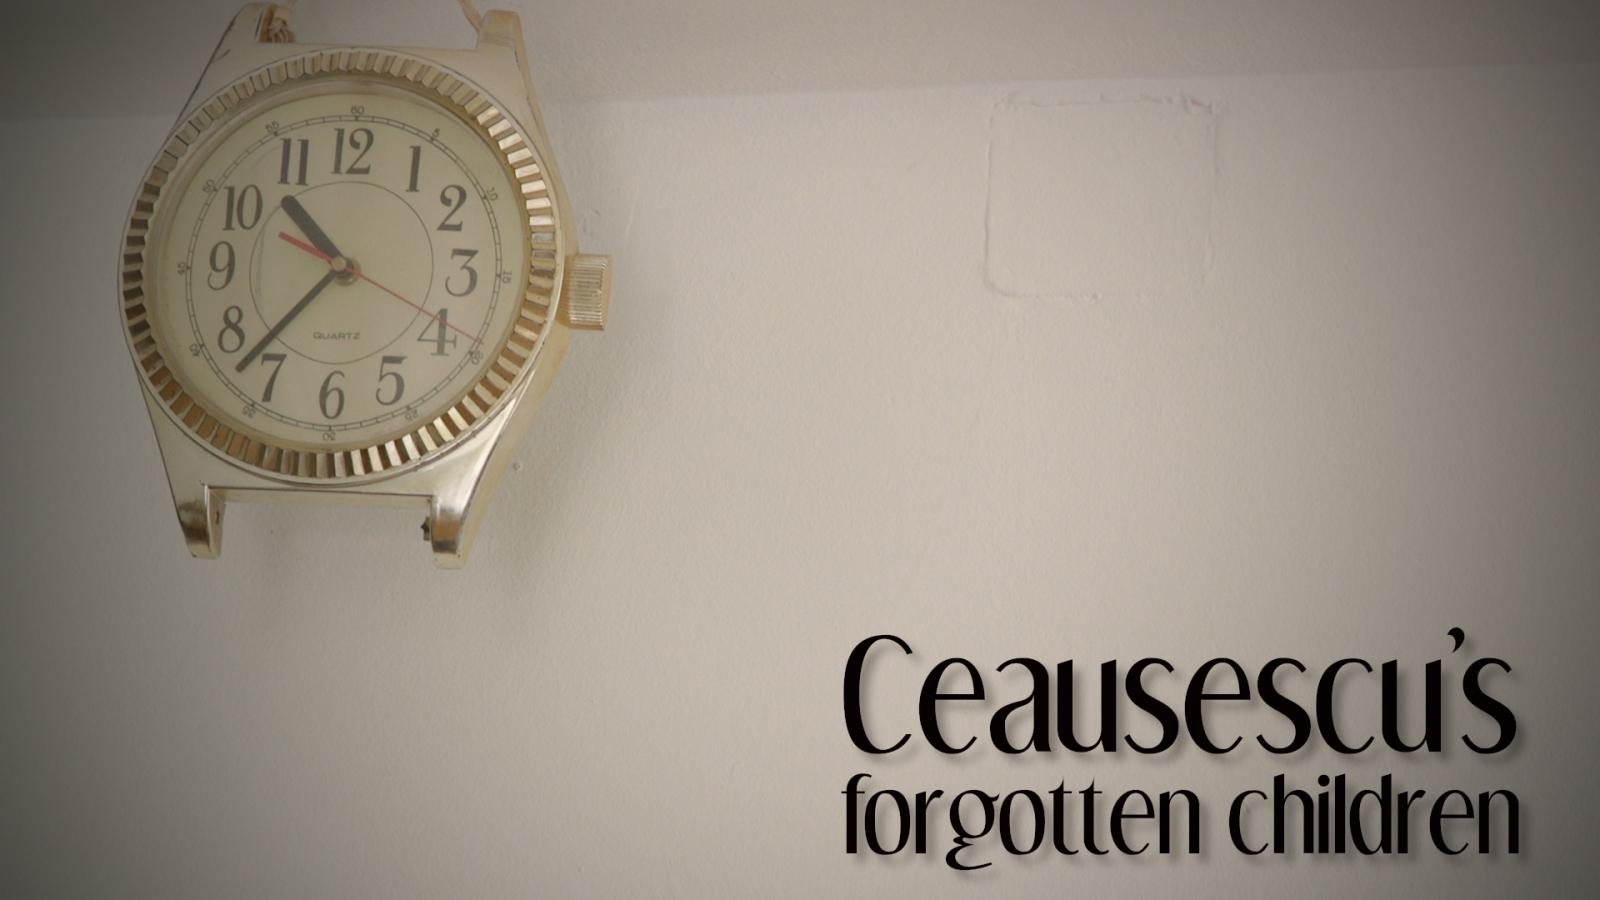 Ceausescu's forgotten children